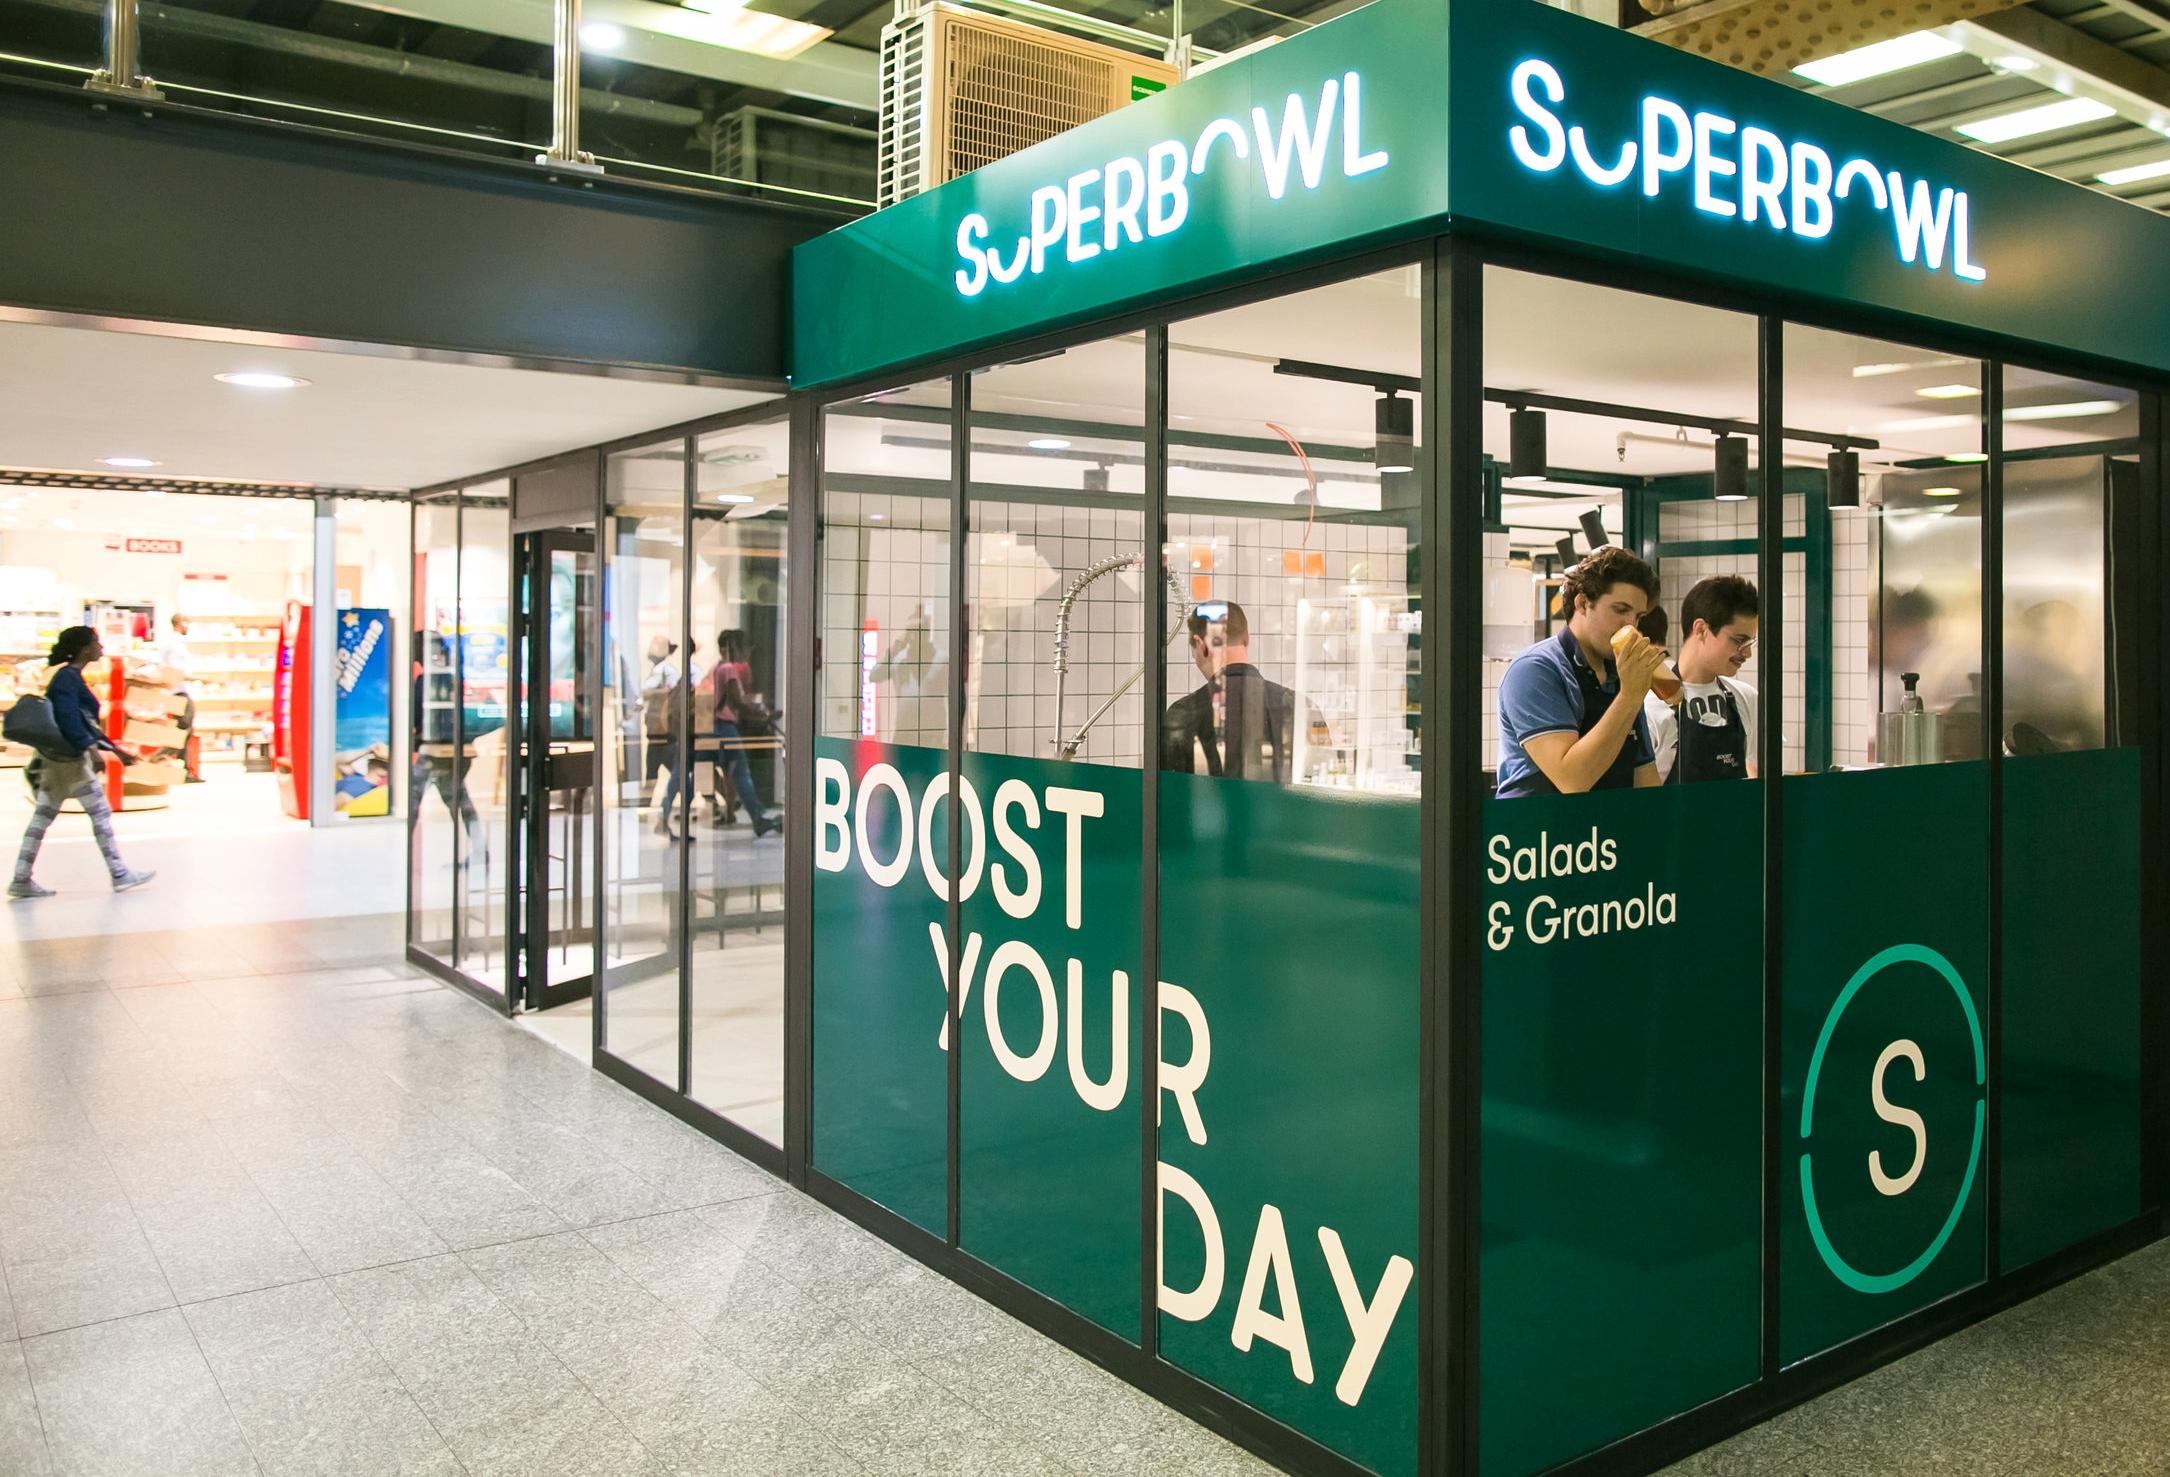 SuperBowl Midi - Gare du Midi - Midi Zuidstation (Mainhall gate 15/16)47 avenue Fonsny - 1060 St-GillesHoursM-Fr : 7.00–20.00Sa : 10.00 - 20.00Su :: 10.00 - 20.00